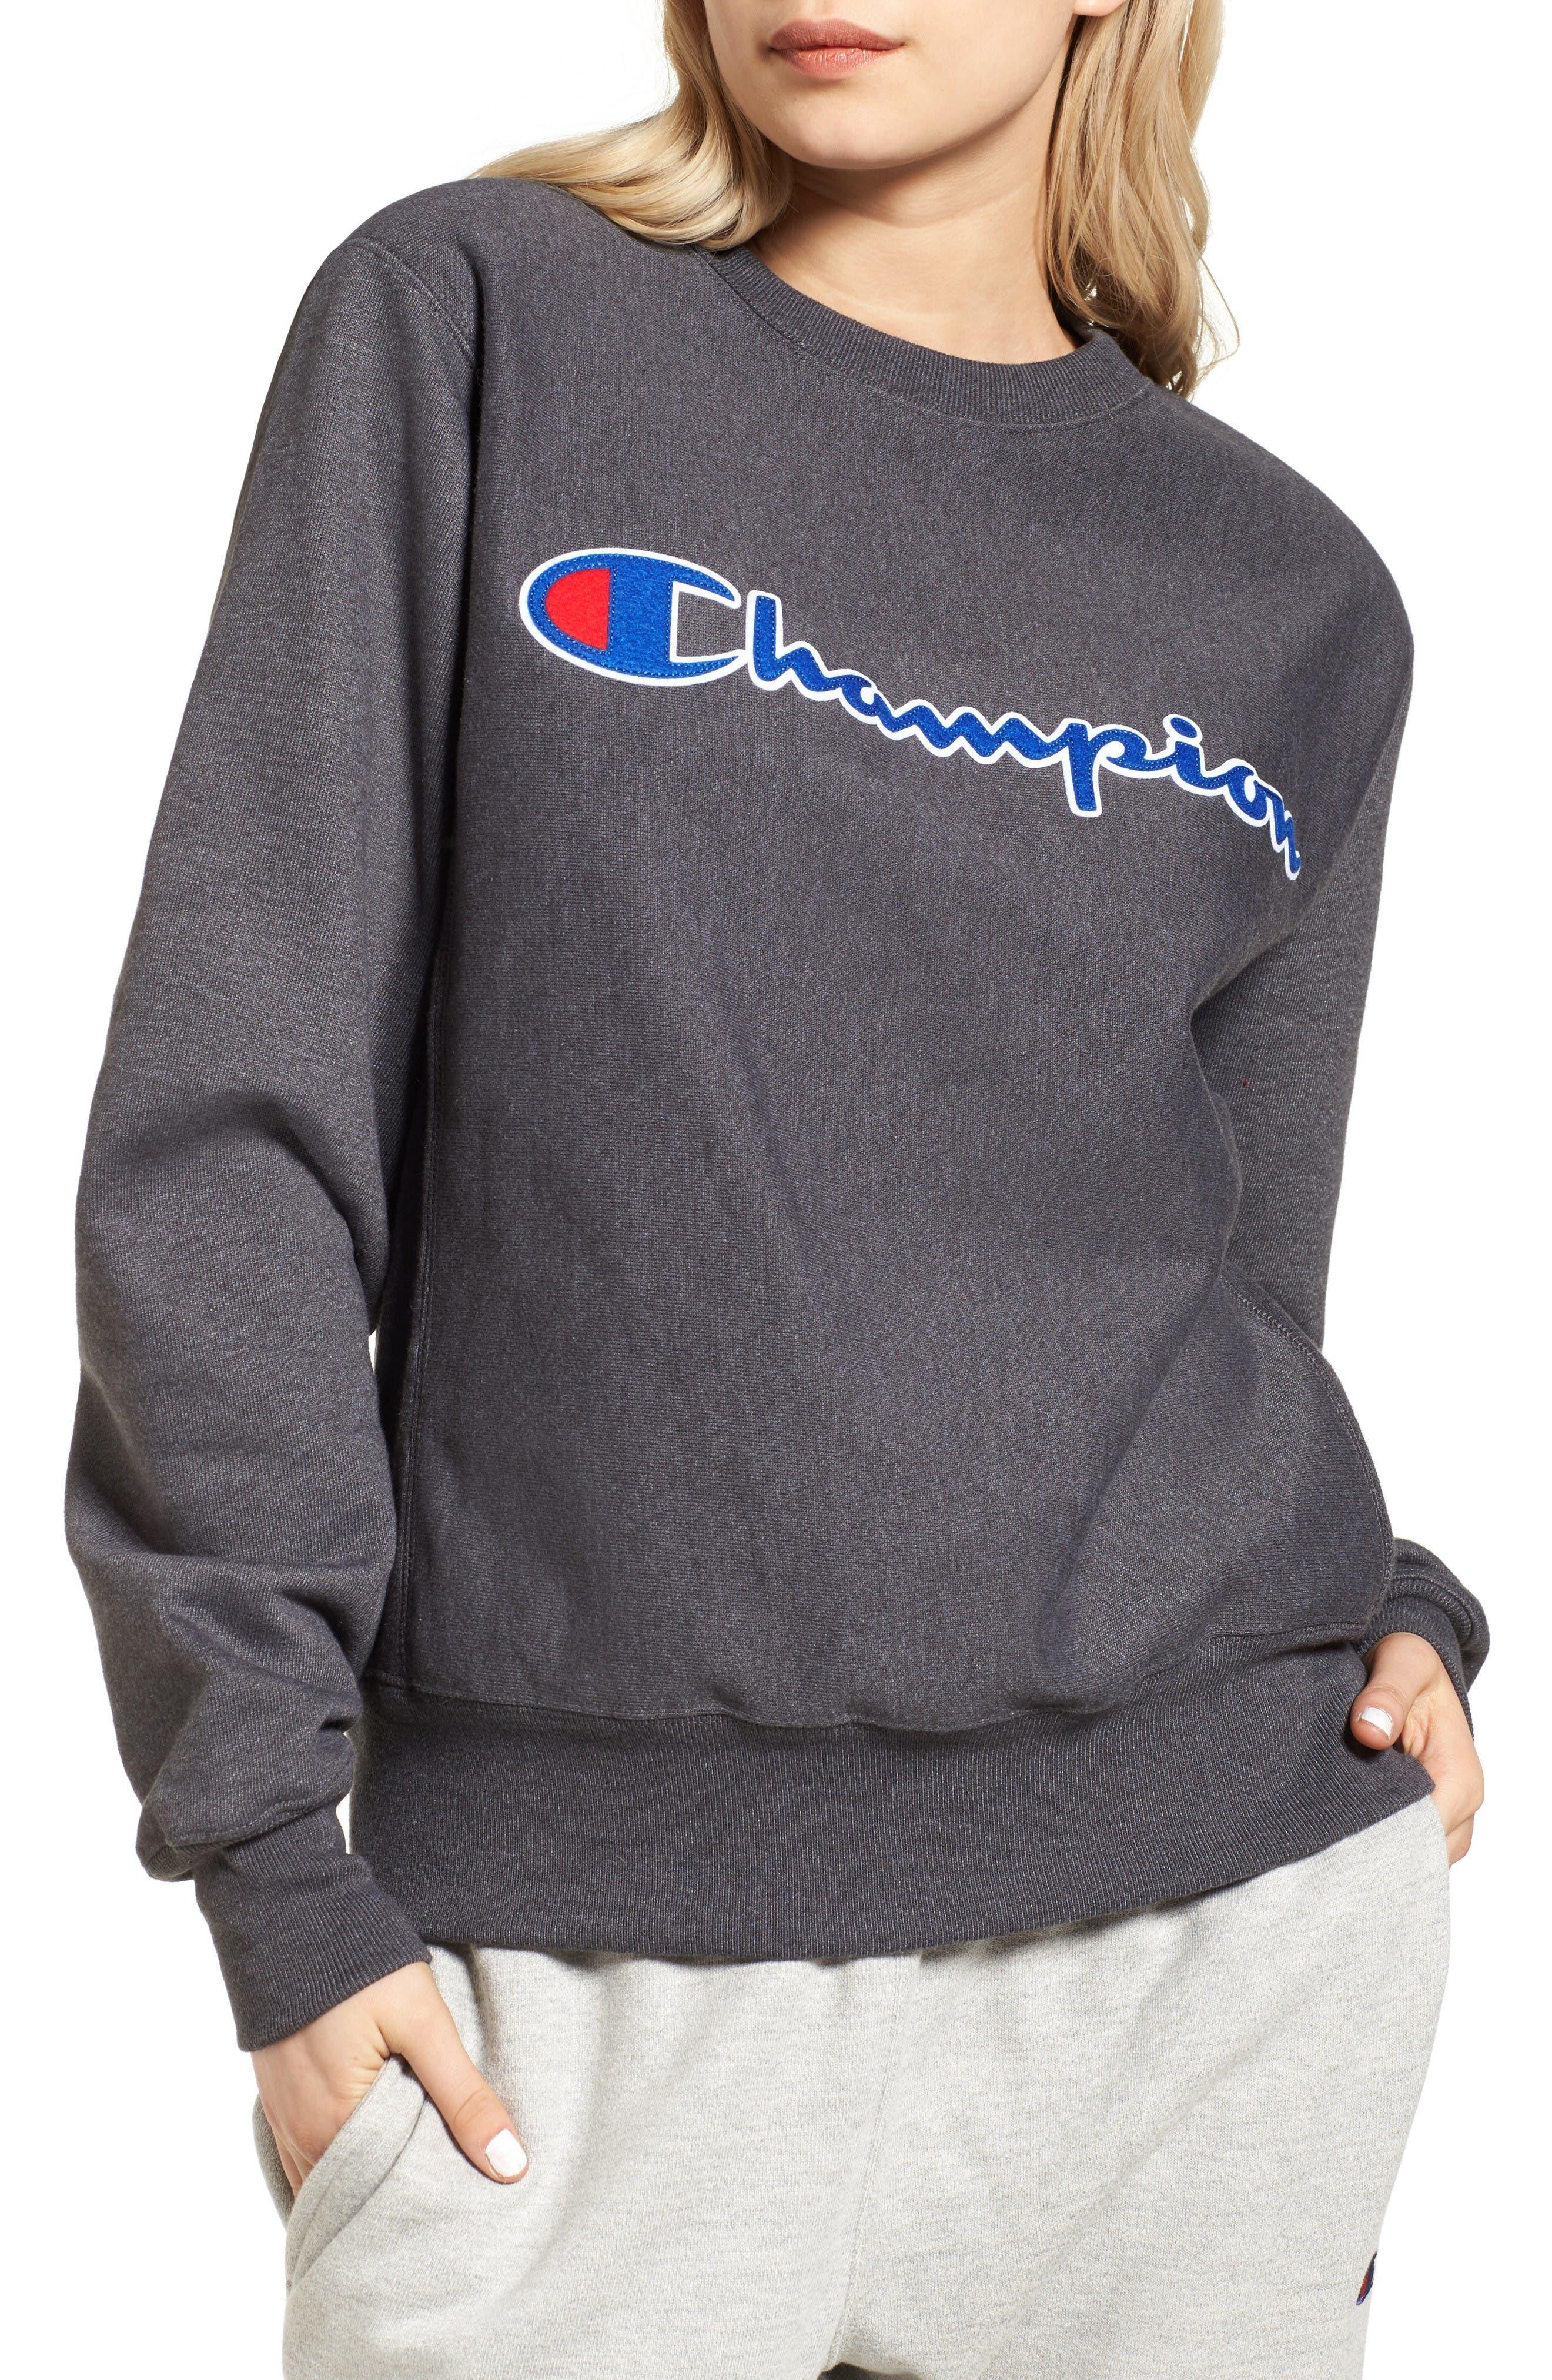 Main Image - Champion Crewneck Sweatshirt